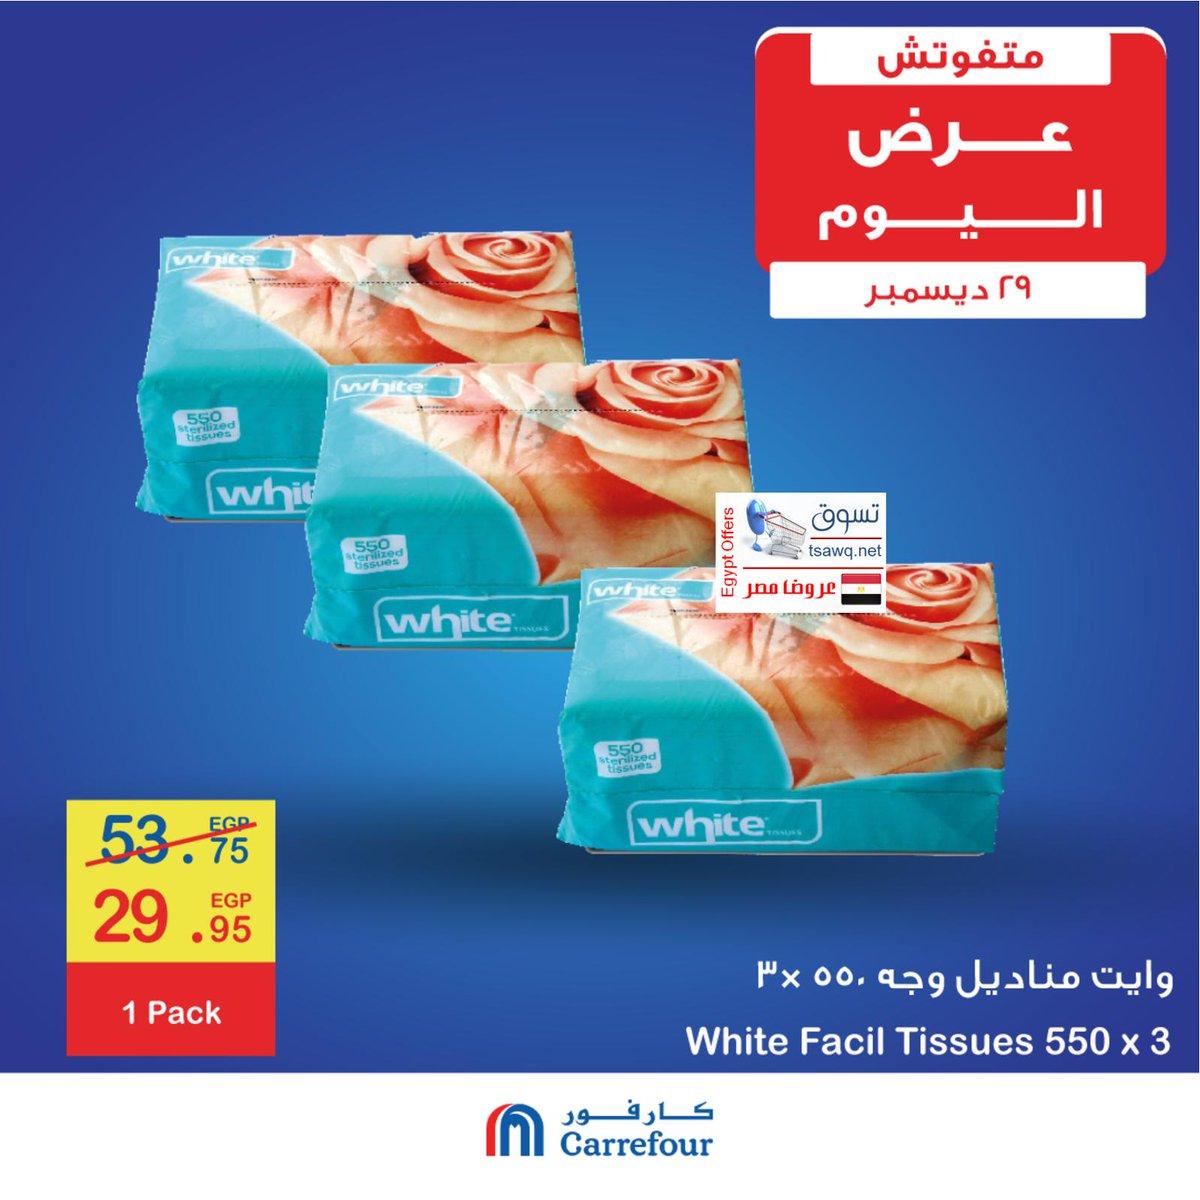 Tsawq Net Egypt تسوق نت مصر On Twitter عروض كارفور مصر فقط السبت